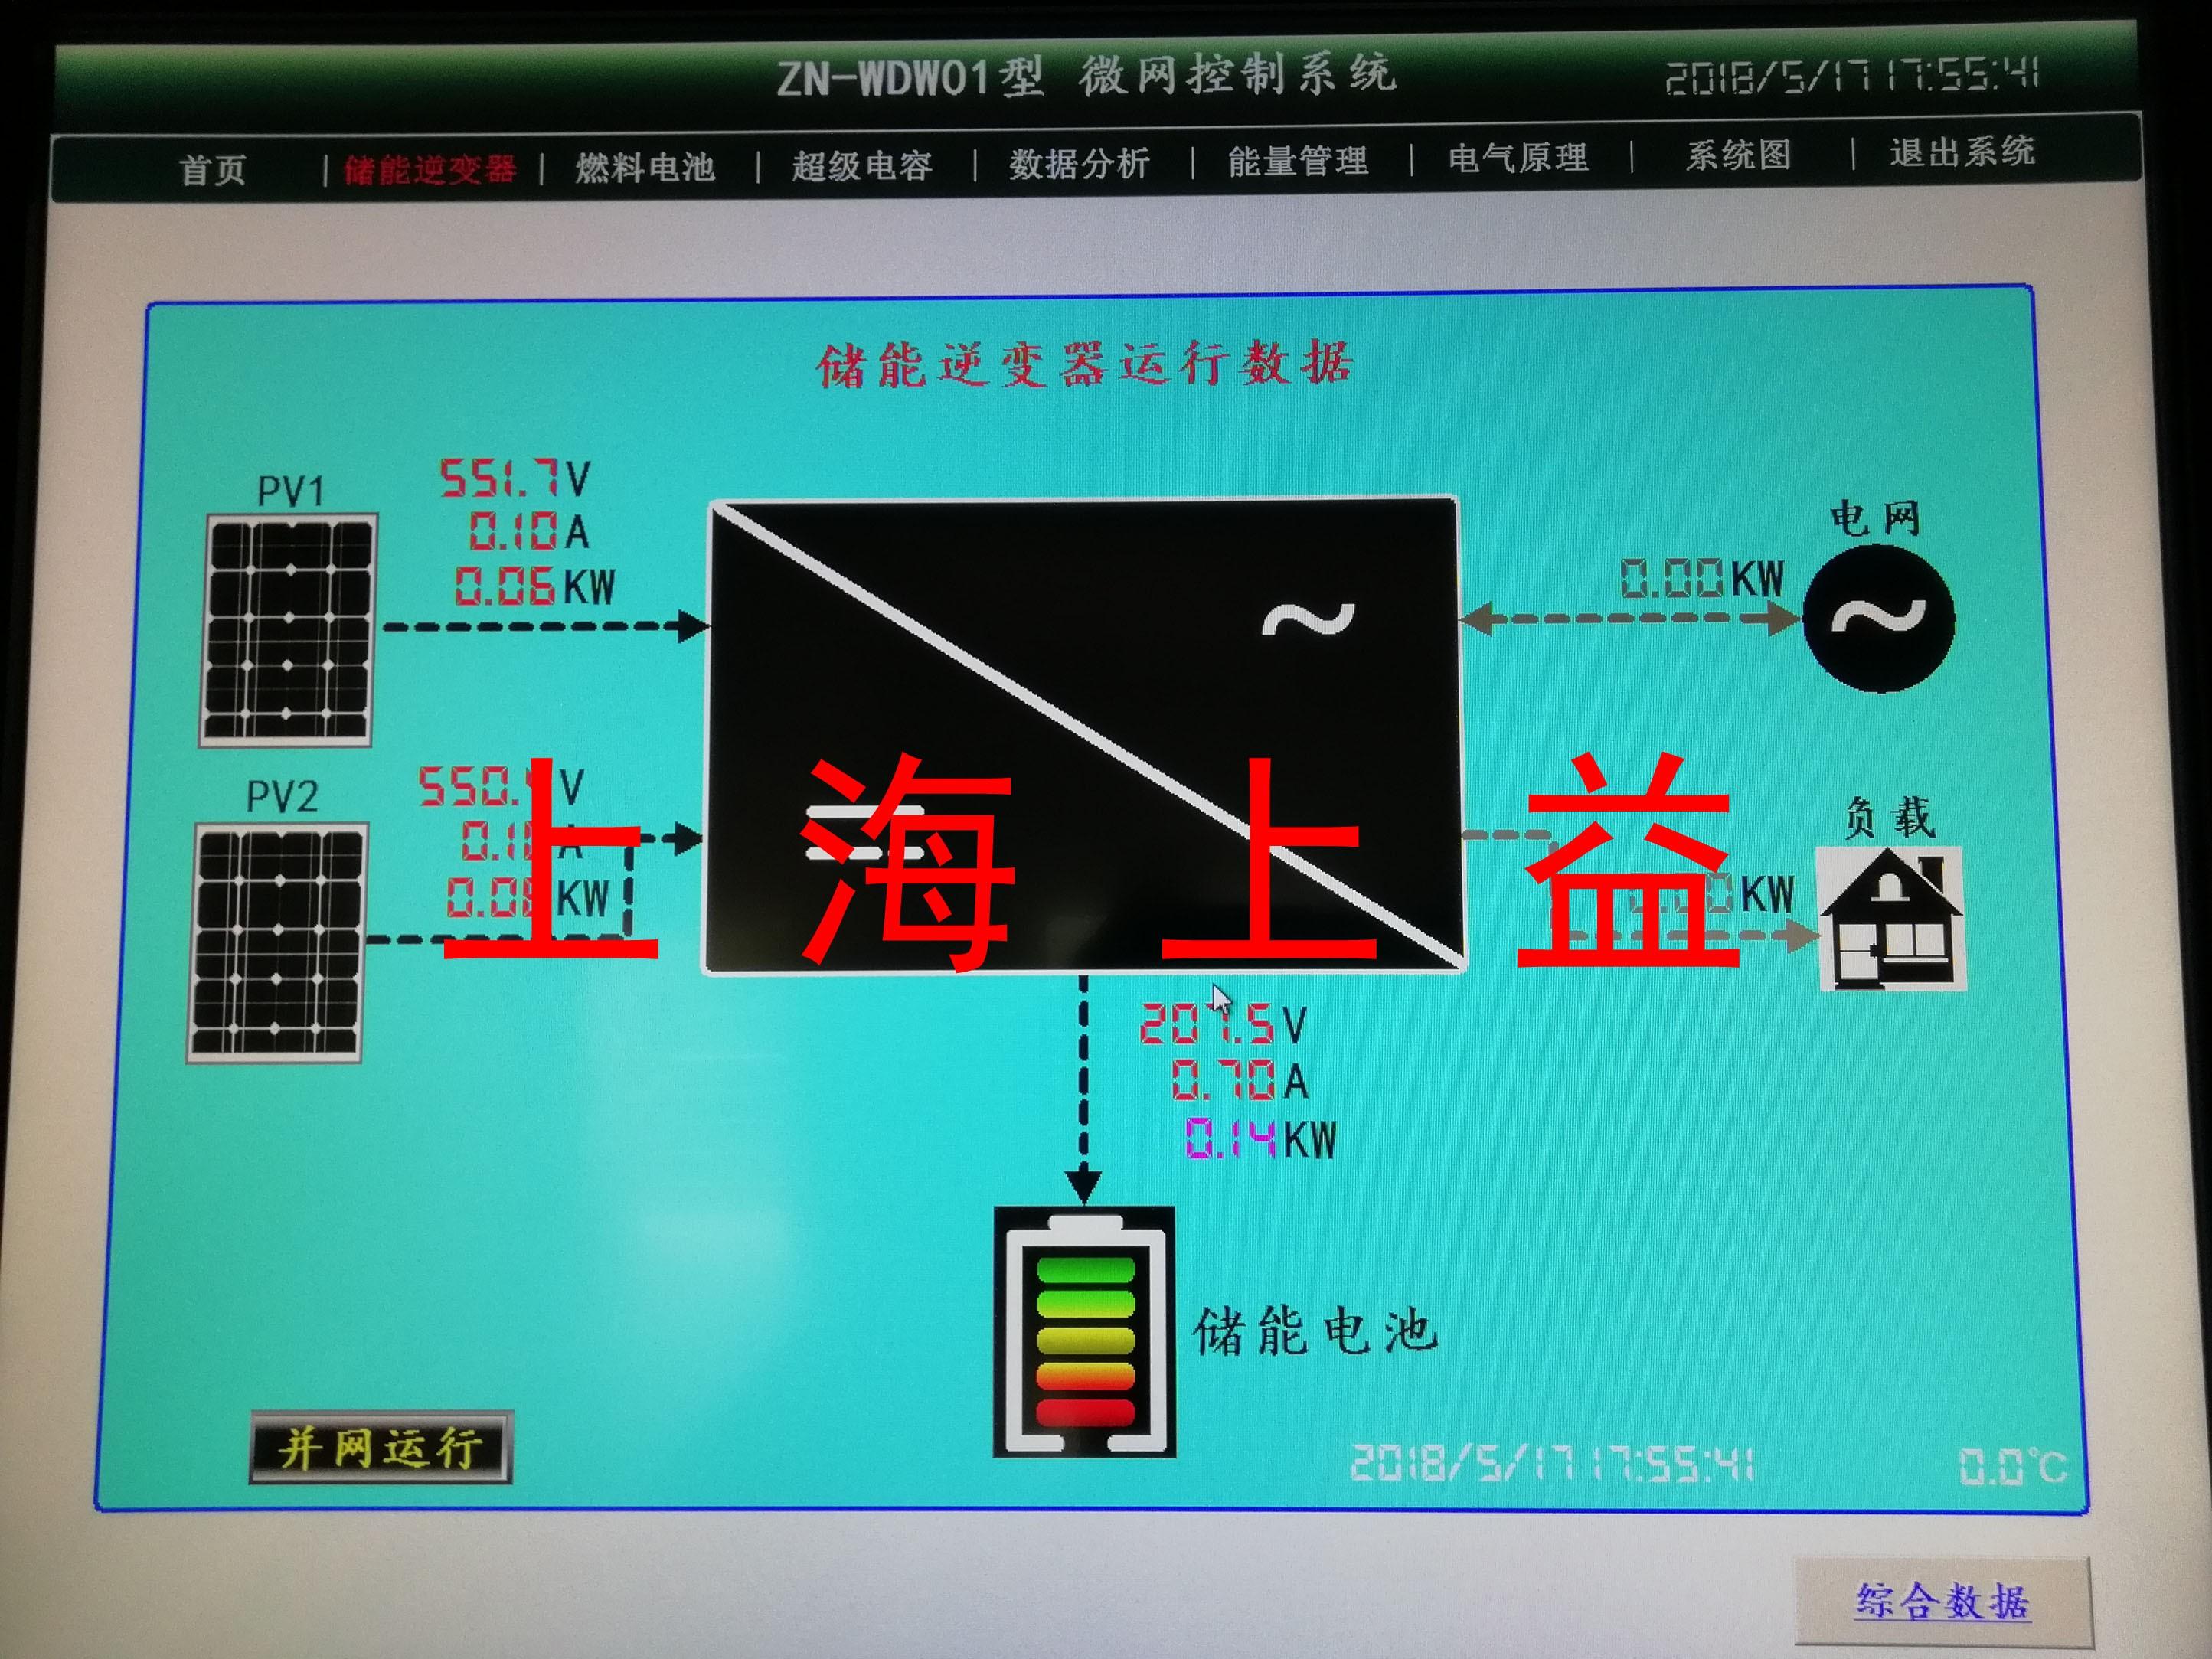 DZ-140926-7-供电系统含显示屏操作台